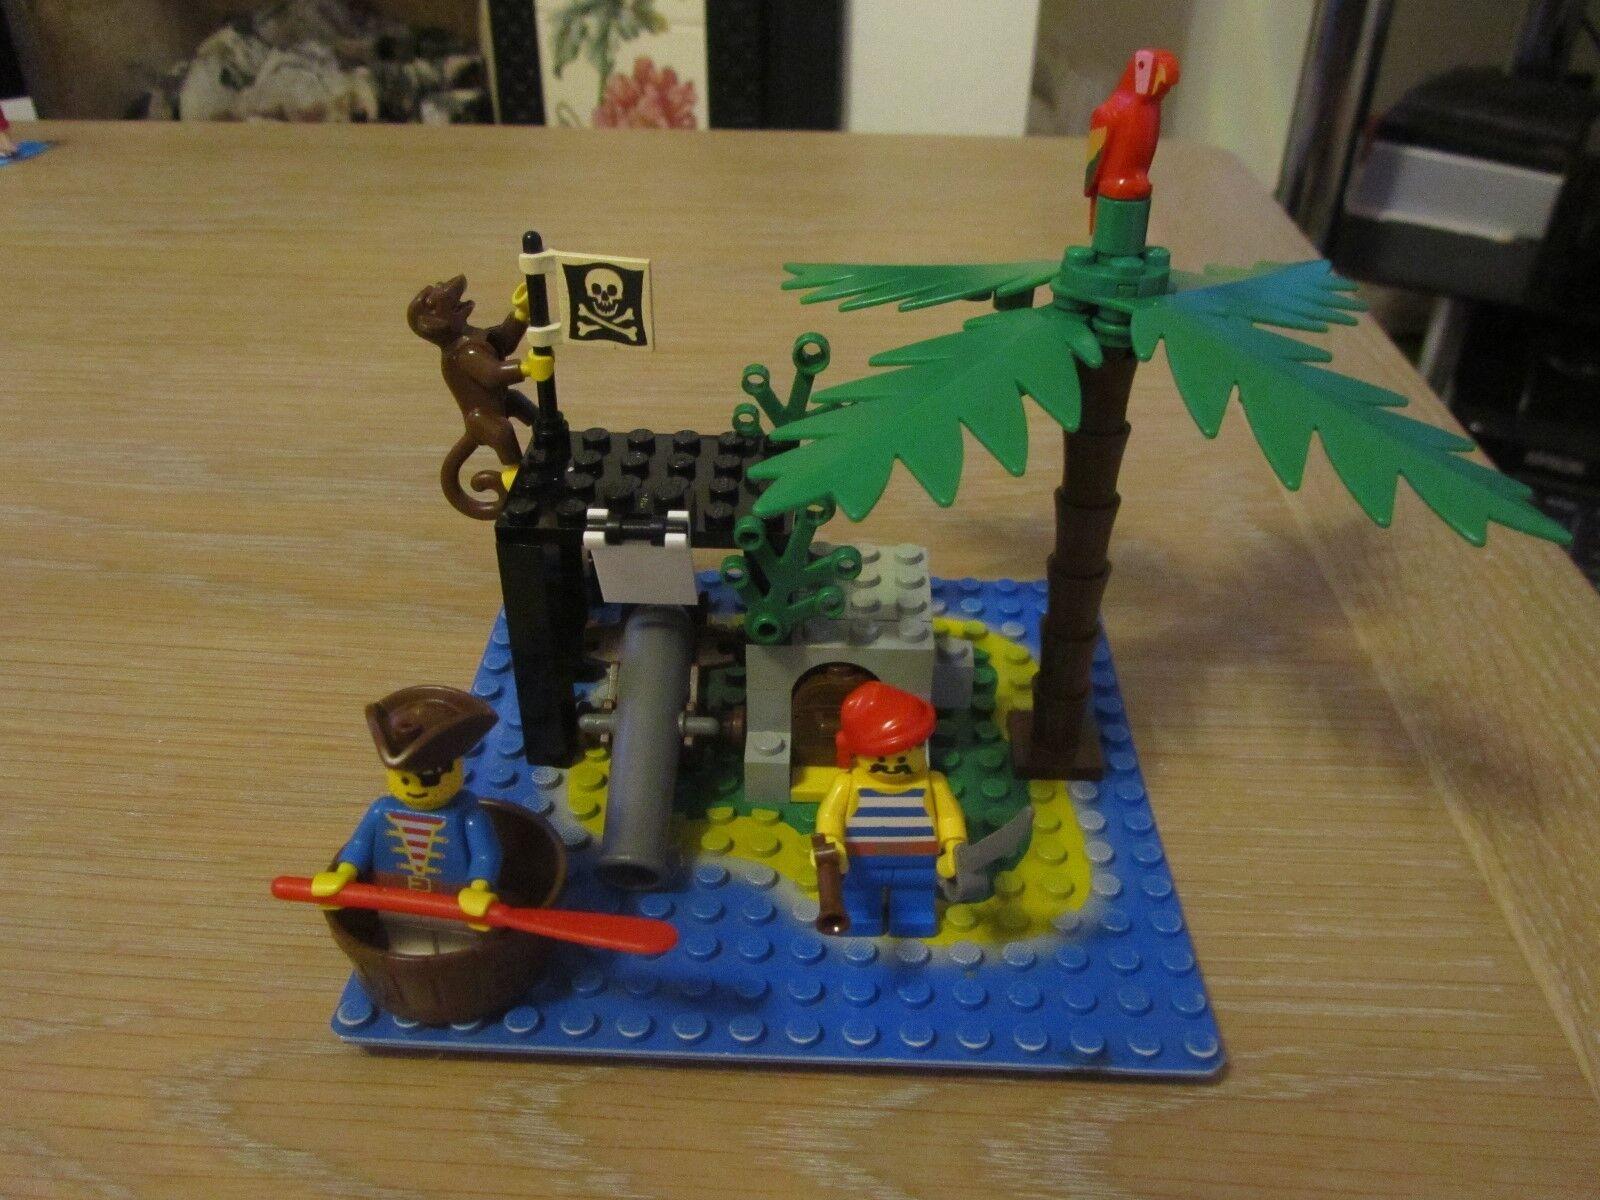 VINTAGE LEGO 6260 PIRATES SHIPWRECK ISLAND 100% 100% 100% COMPLETE 5d1eef